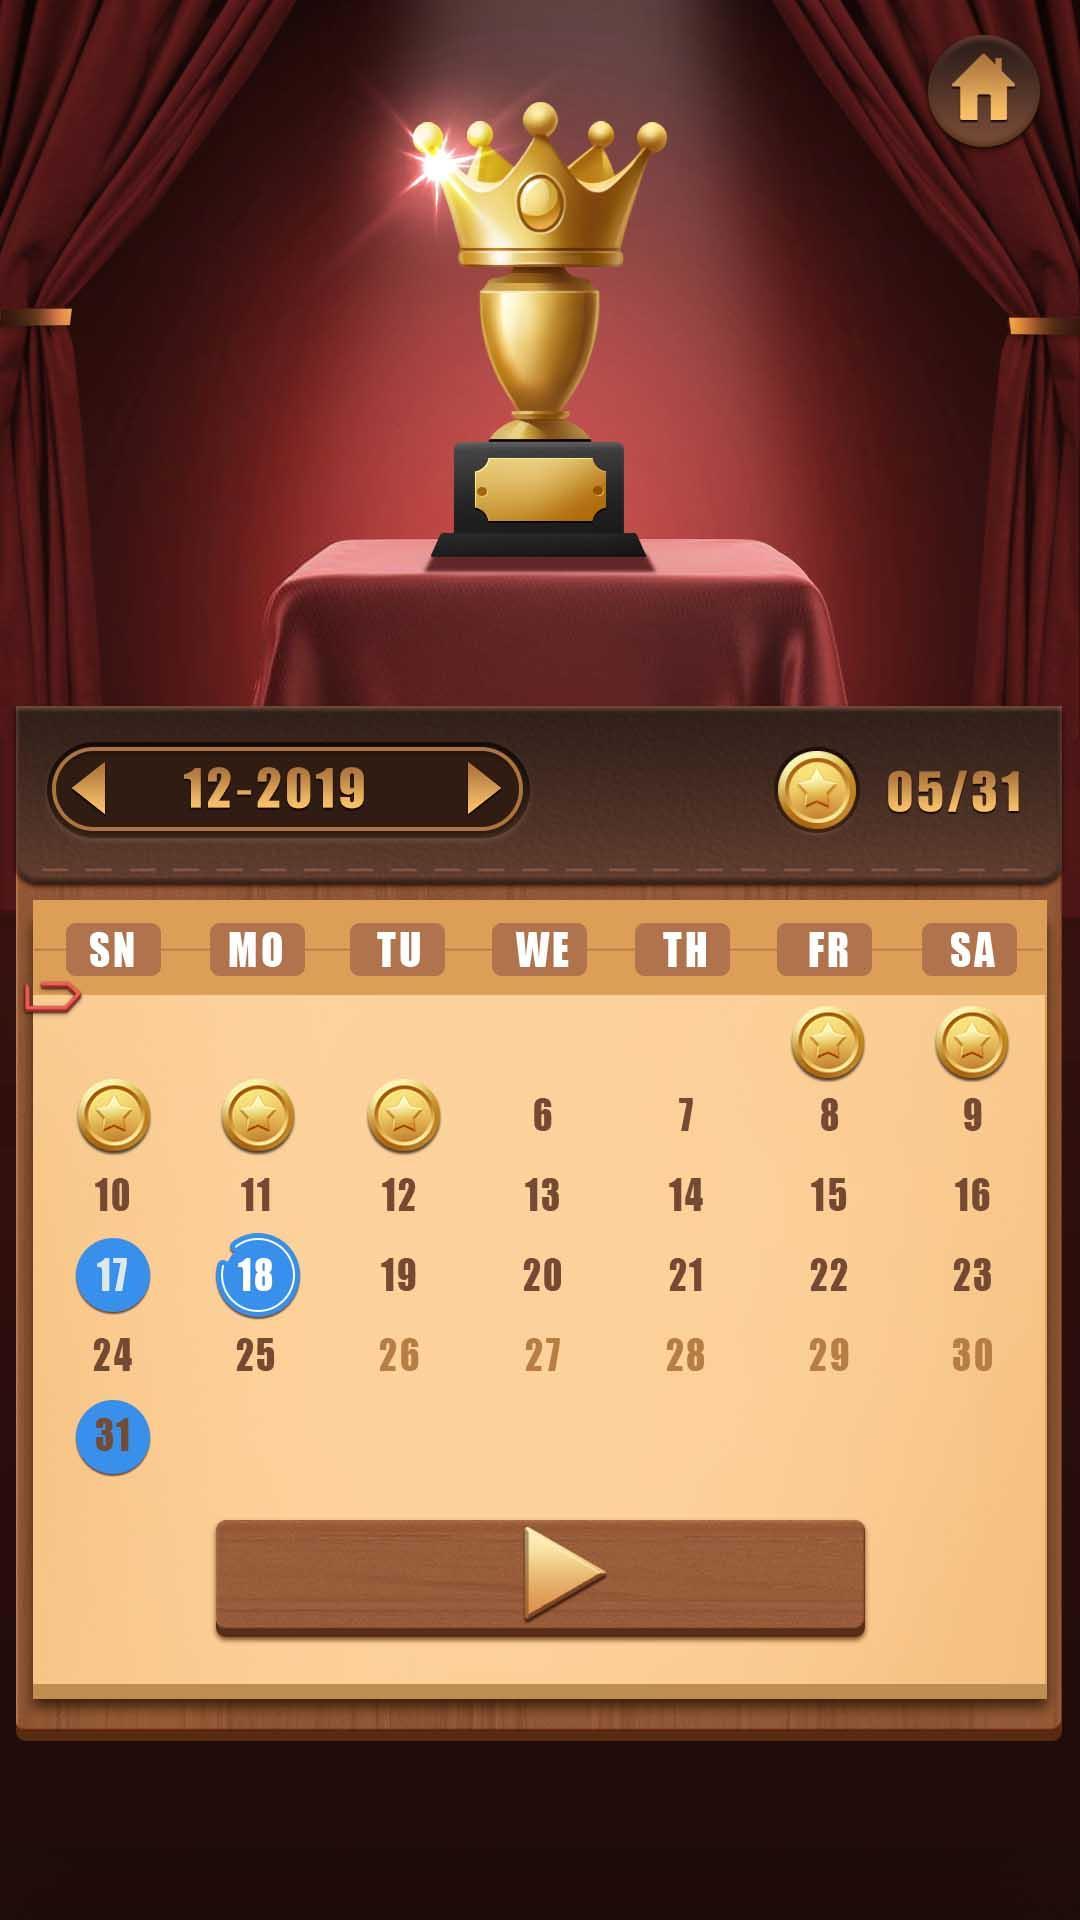 Juego Sudoku Bloque Clásico de Rompecabezas Mental